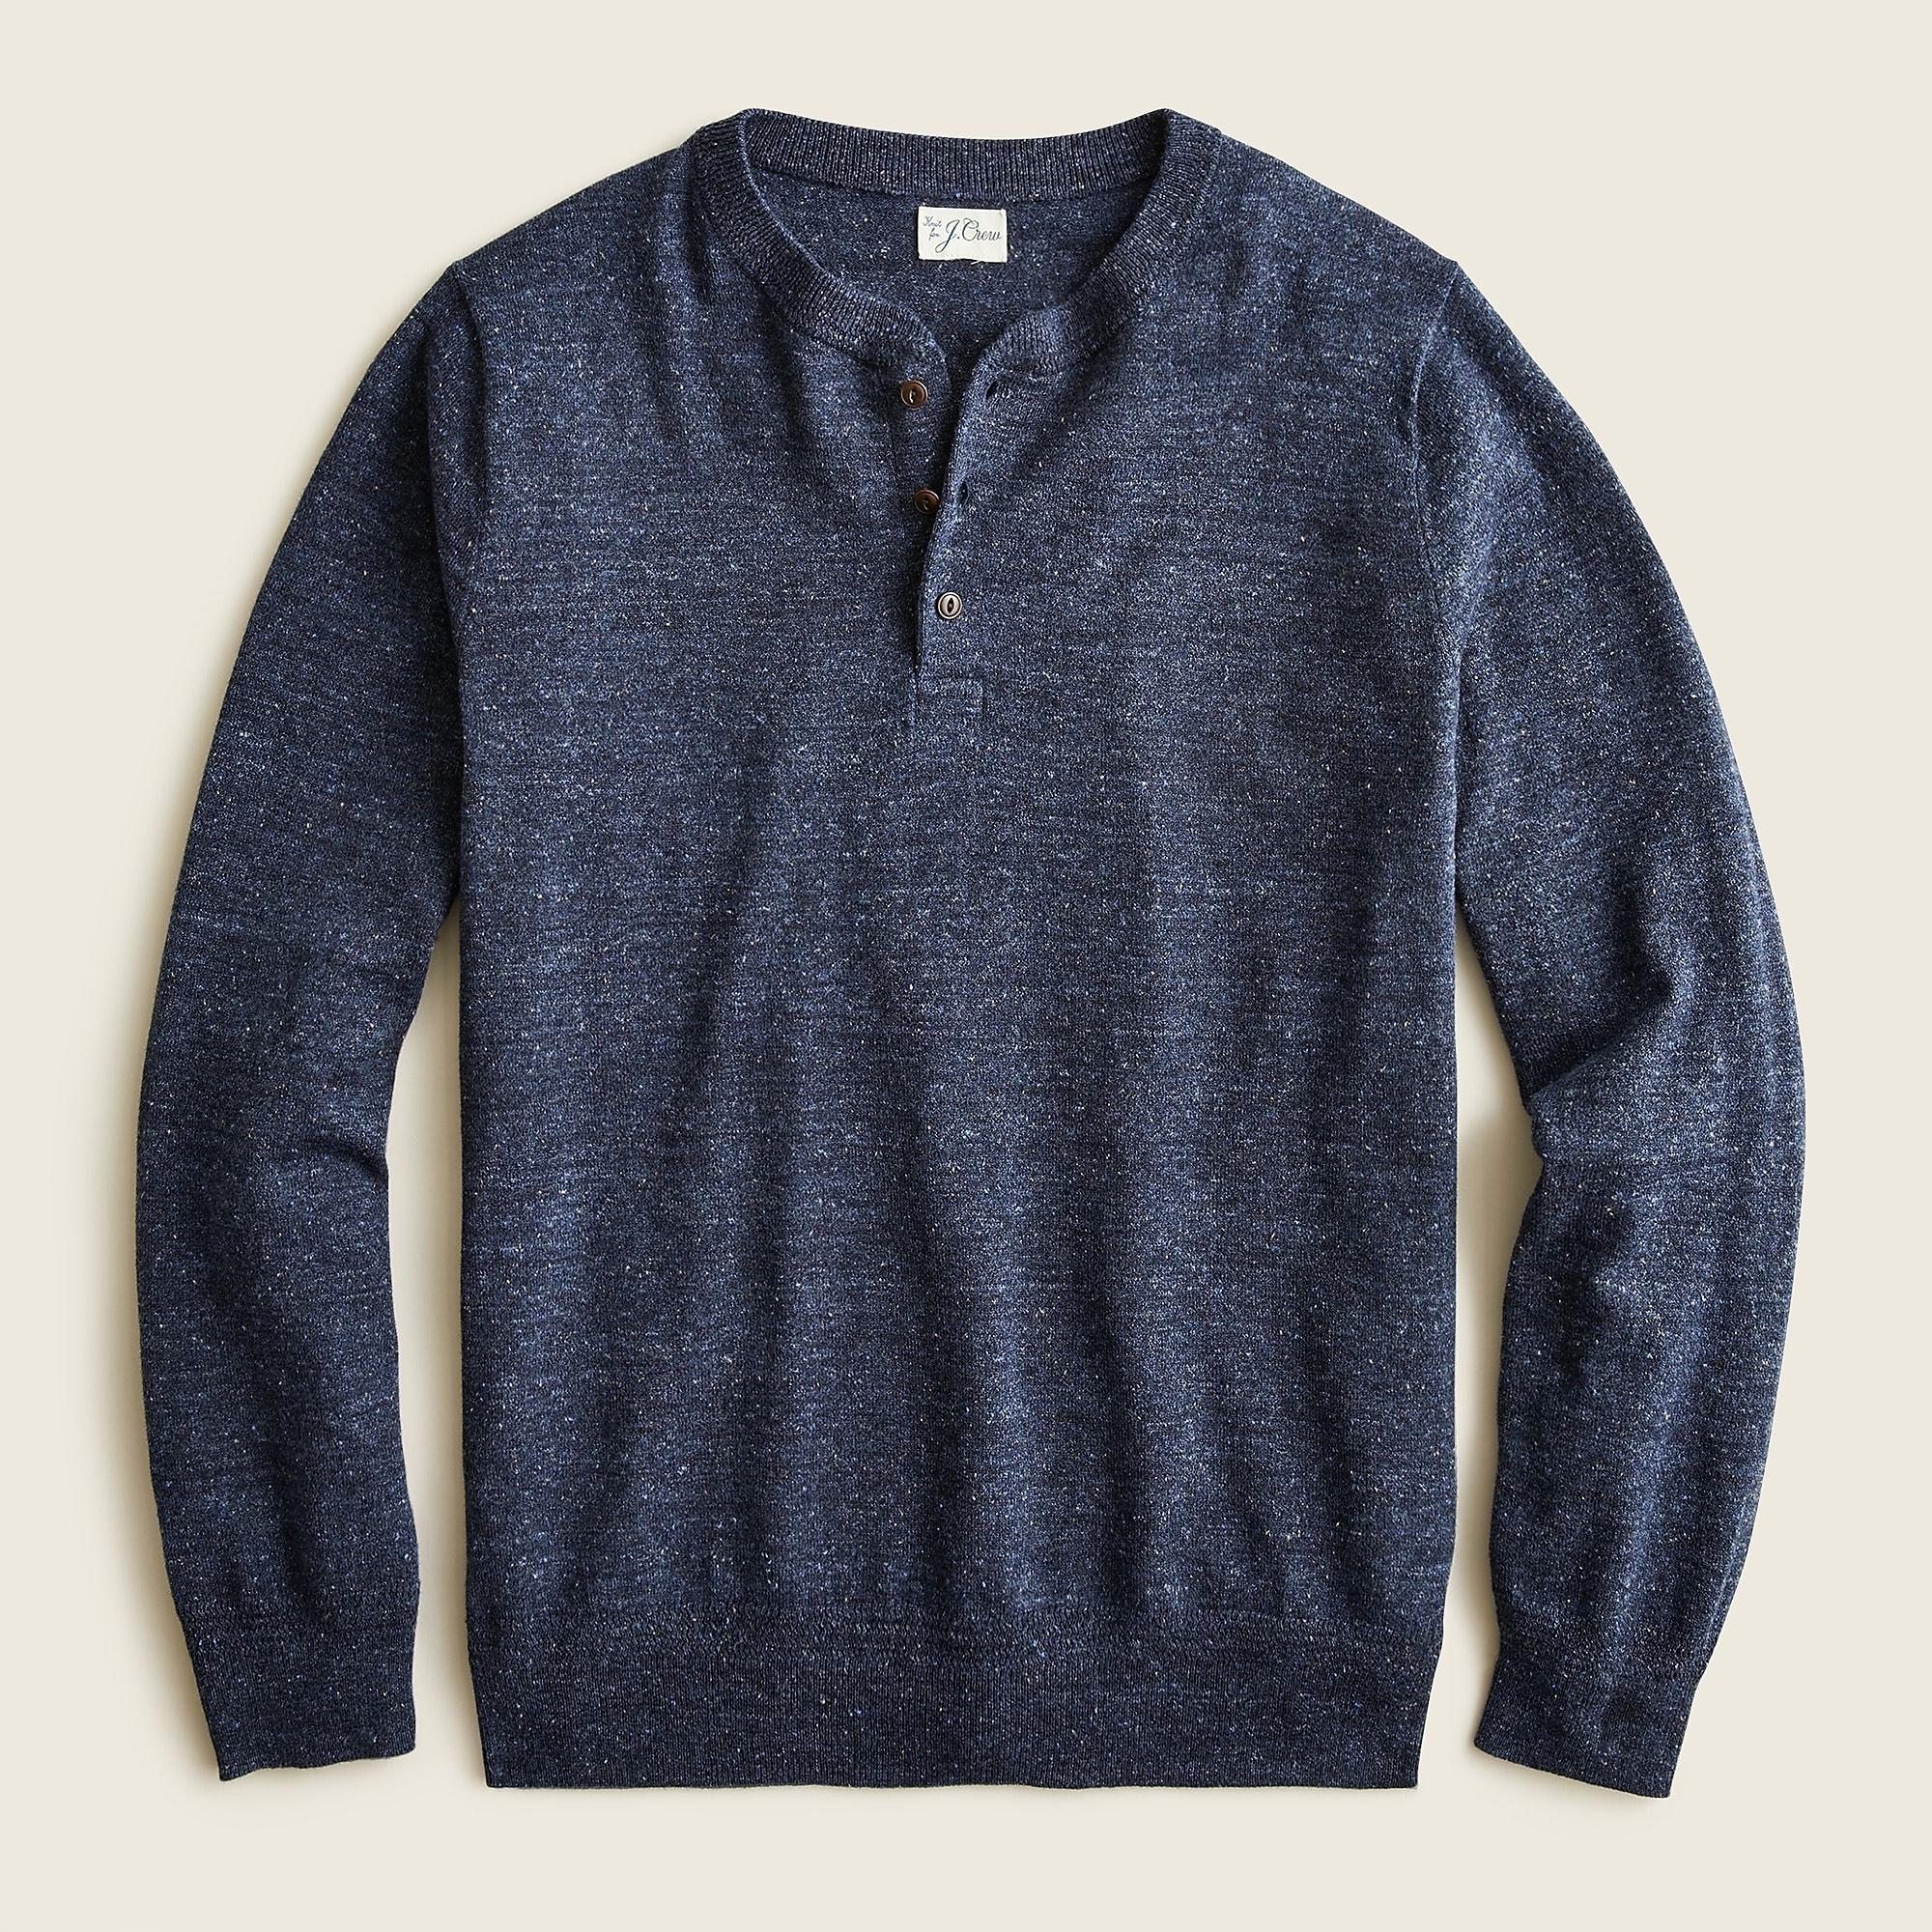 J.Crew Cotton Silk Donegal Tweed Henley Sweater, best mens sweater